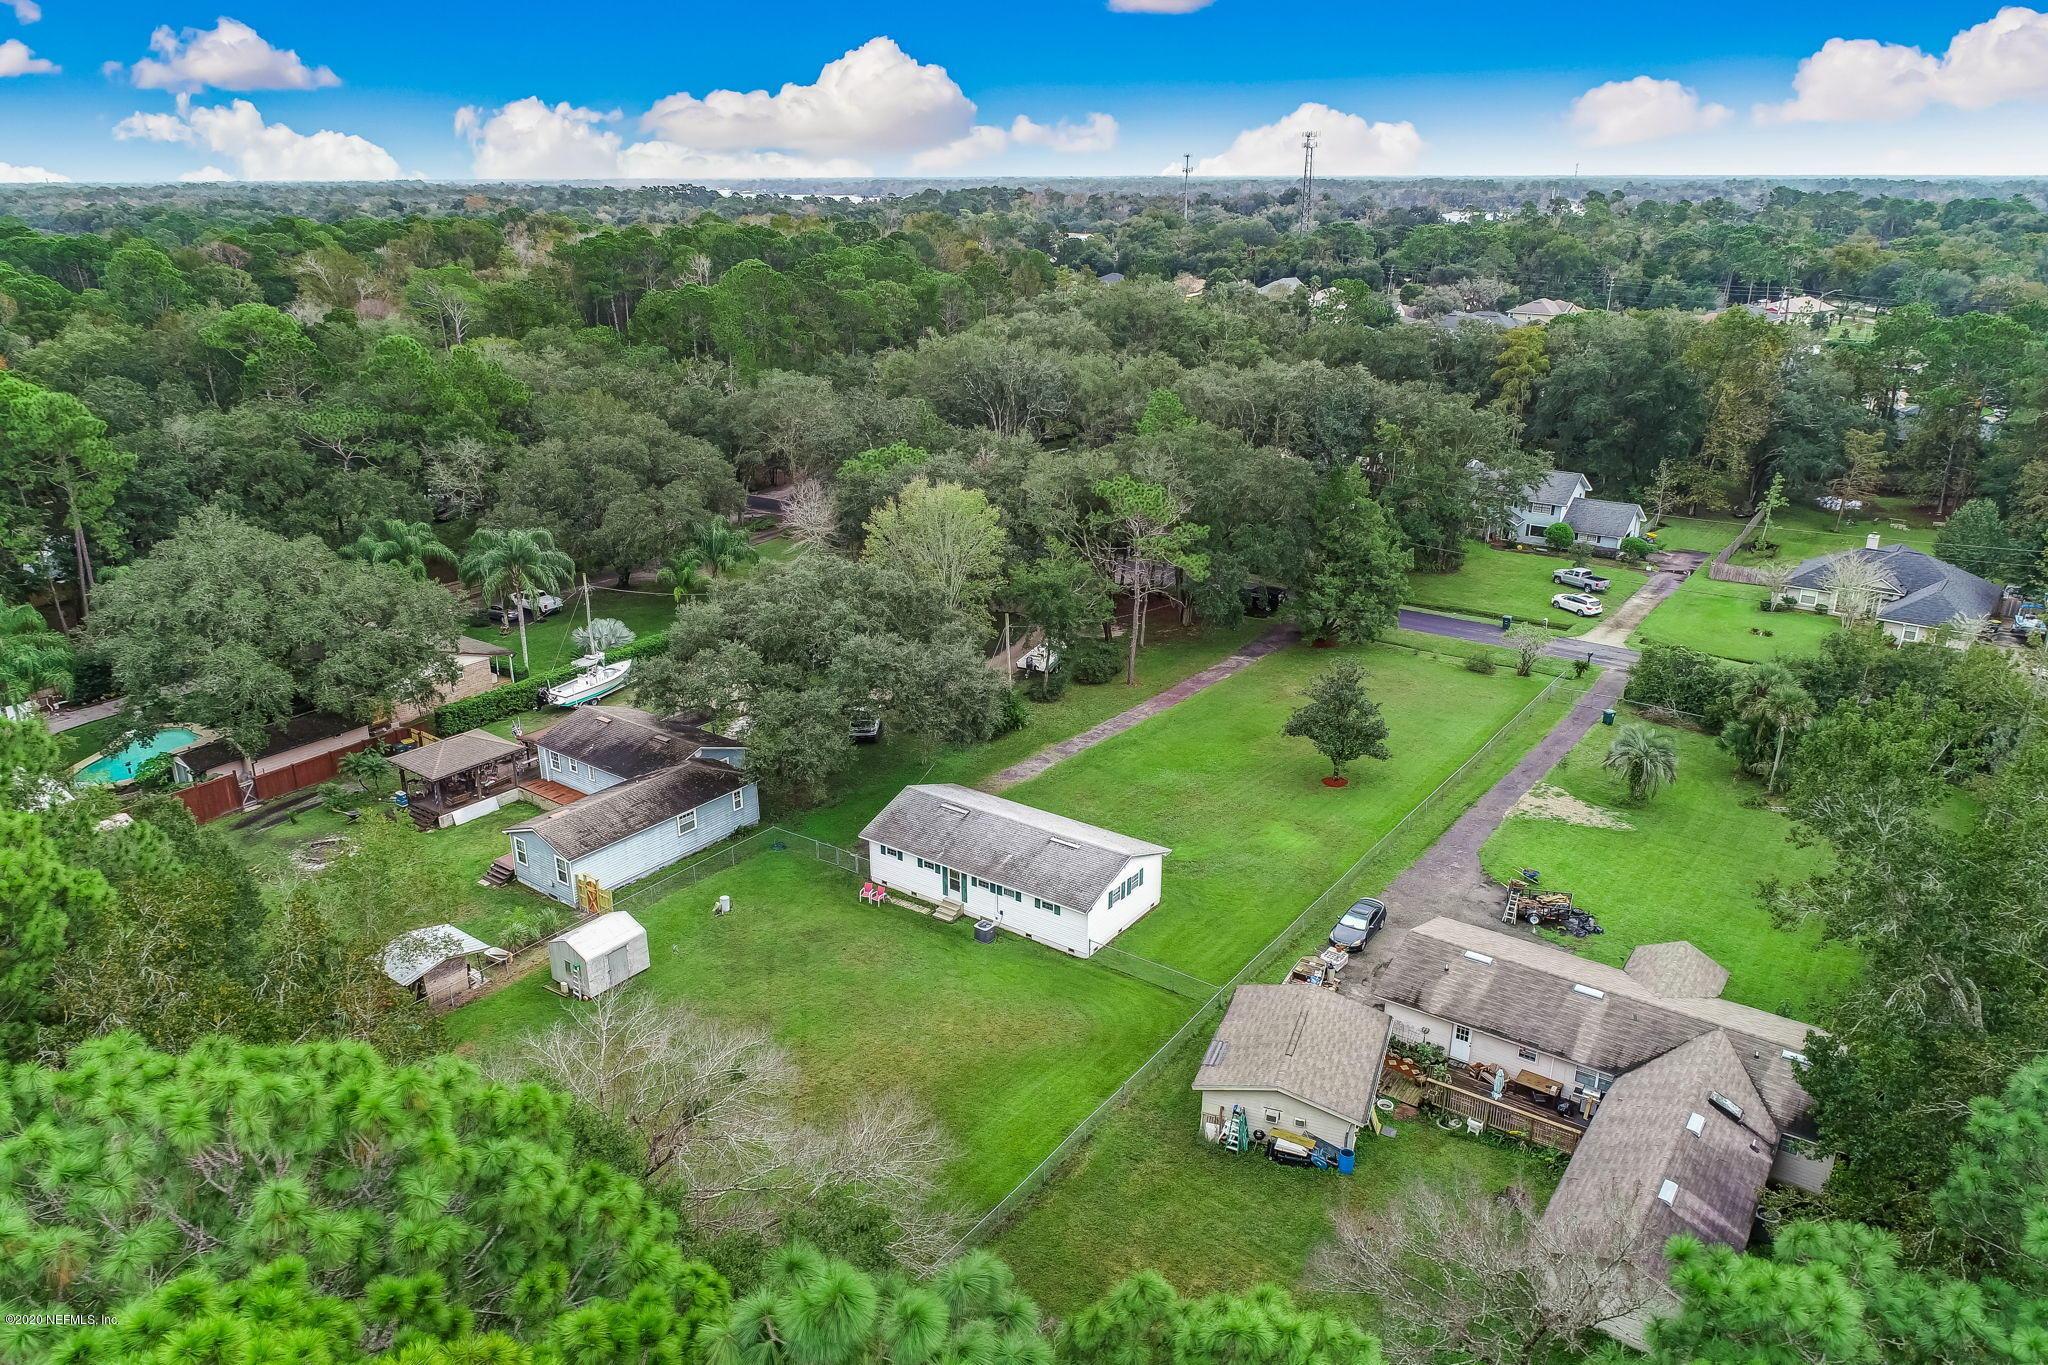 2795 MANDARIN MEADOWS, JACKSONVILLE, FLORIDA 32223, 4 Bedrooms Bedrooms, ,1 BathroomBathrooms,Residential,For sale,MANDARIN MEADOWS,1082673